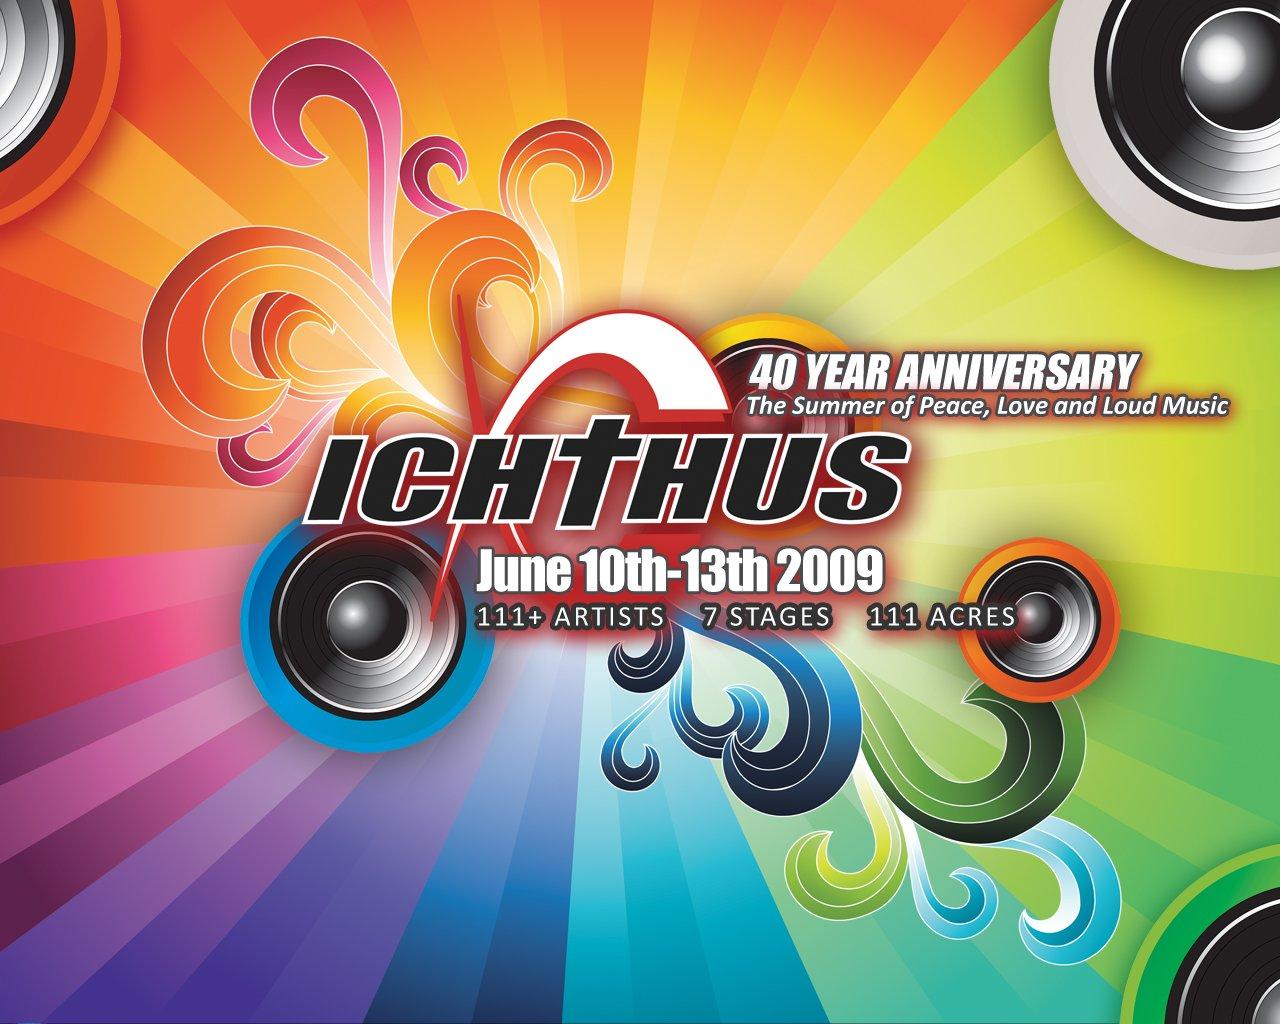 ichthus 2009